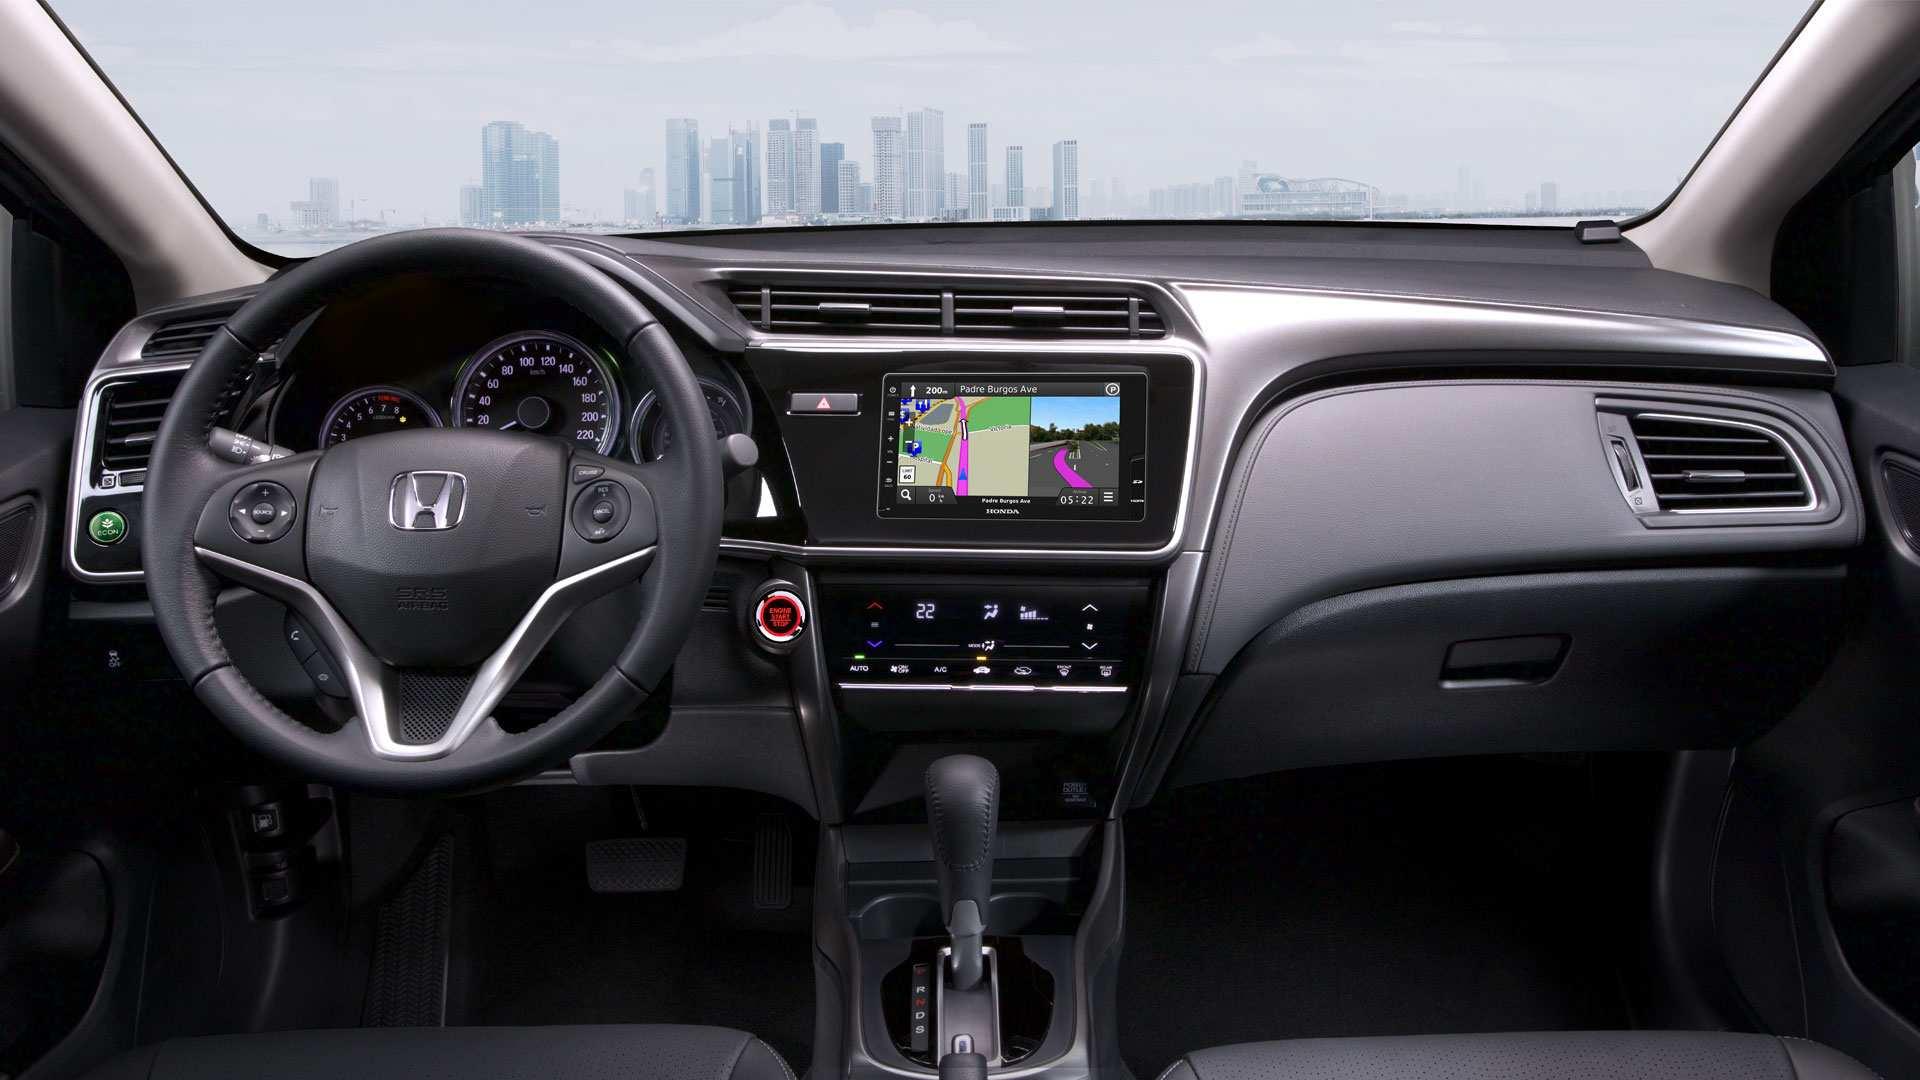 41 New Honda City 2020 Interior Engine by Honda City 2020 Interior